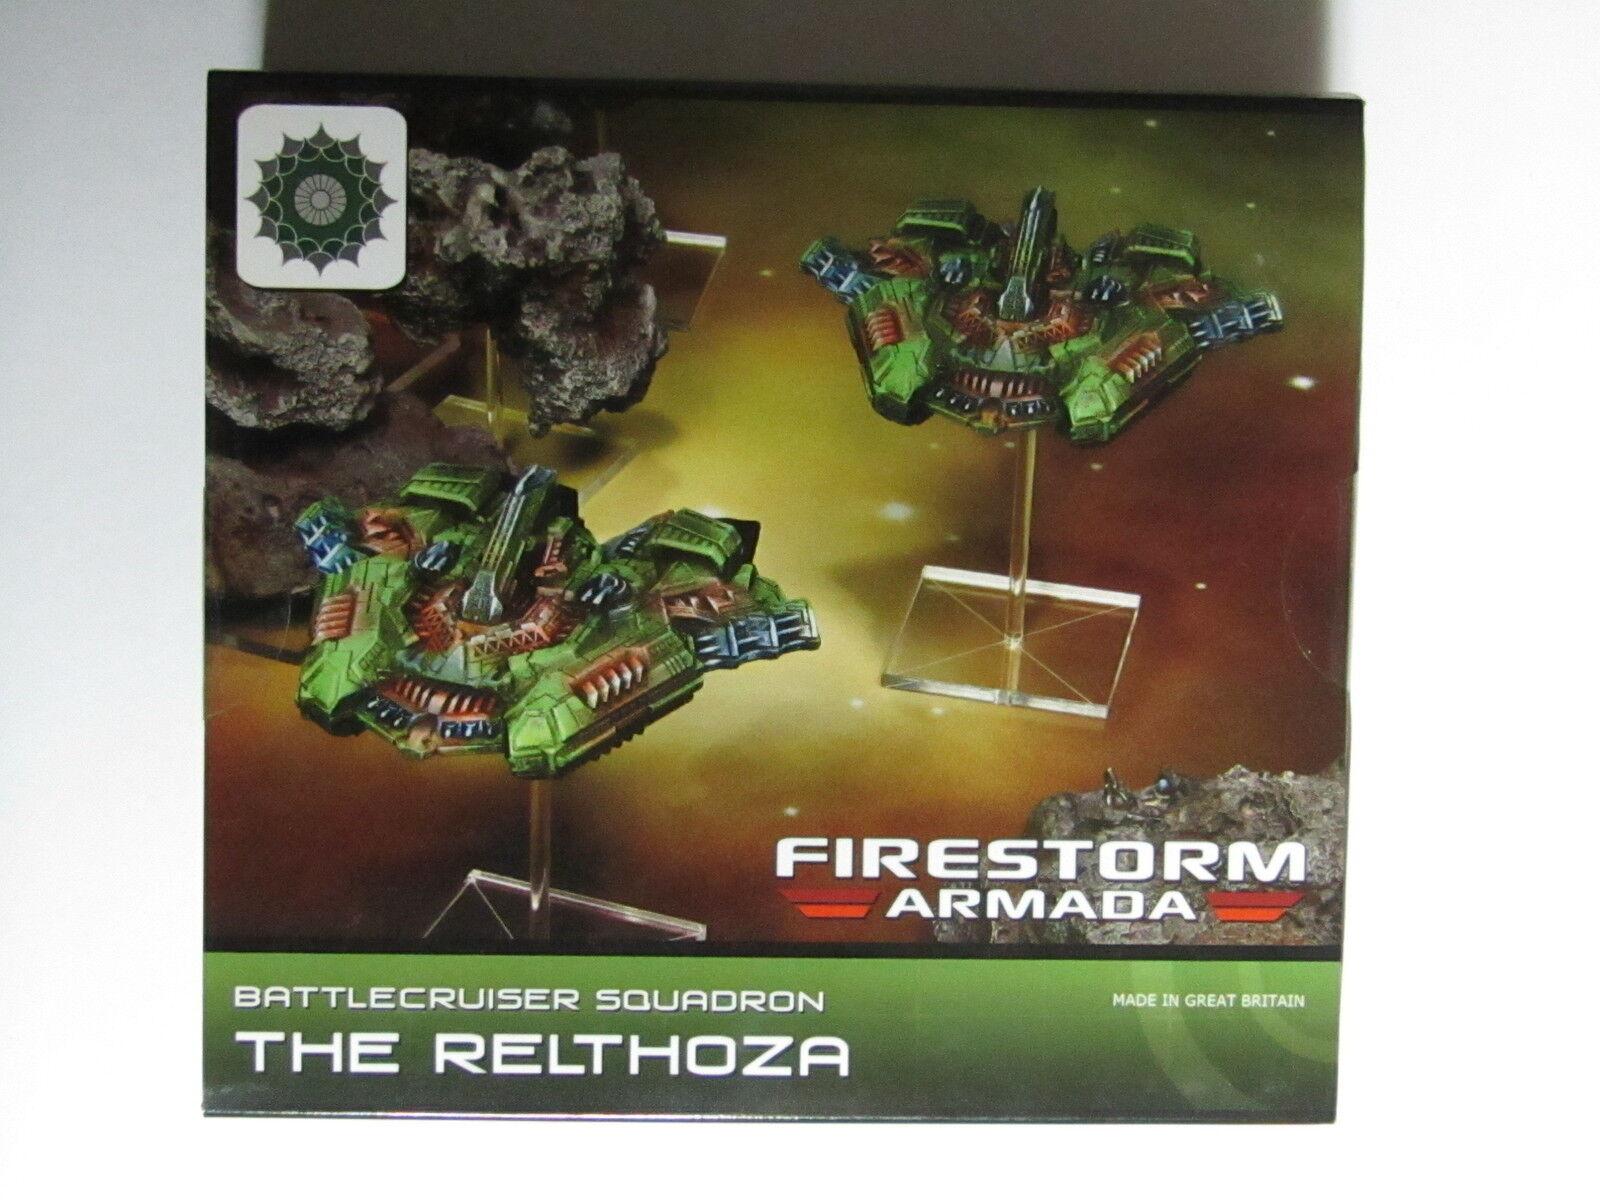 Feuersturm armada - relthoza - battlecruiser staffel - fatr16